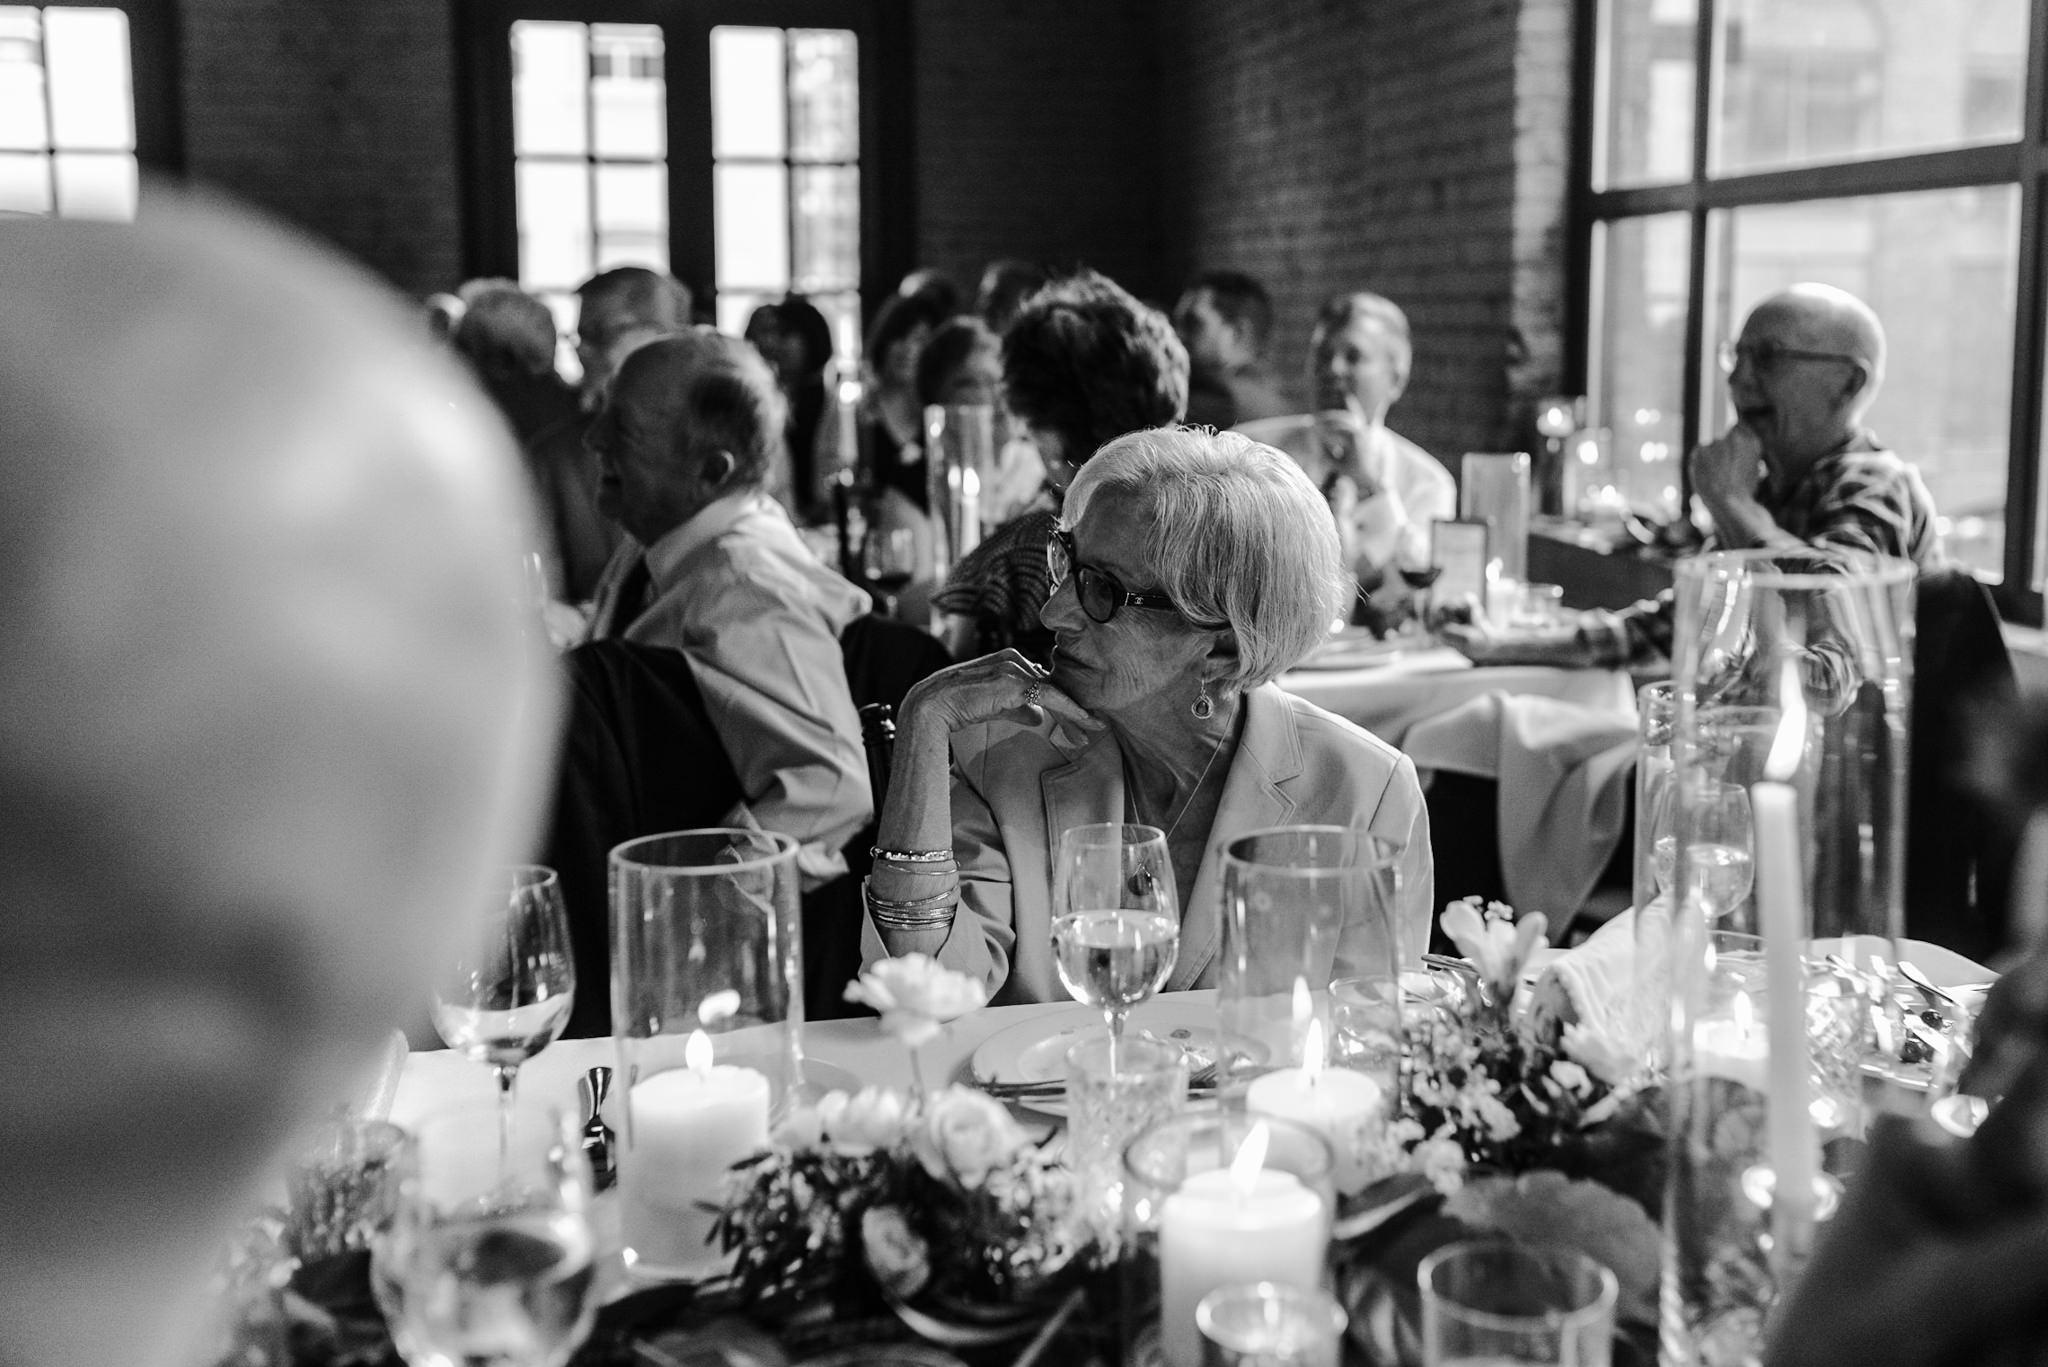 069-guests-candids-documentary-wedding-photographer-reception-storys-toronto.jpg